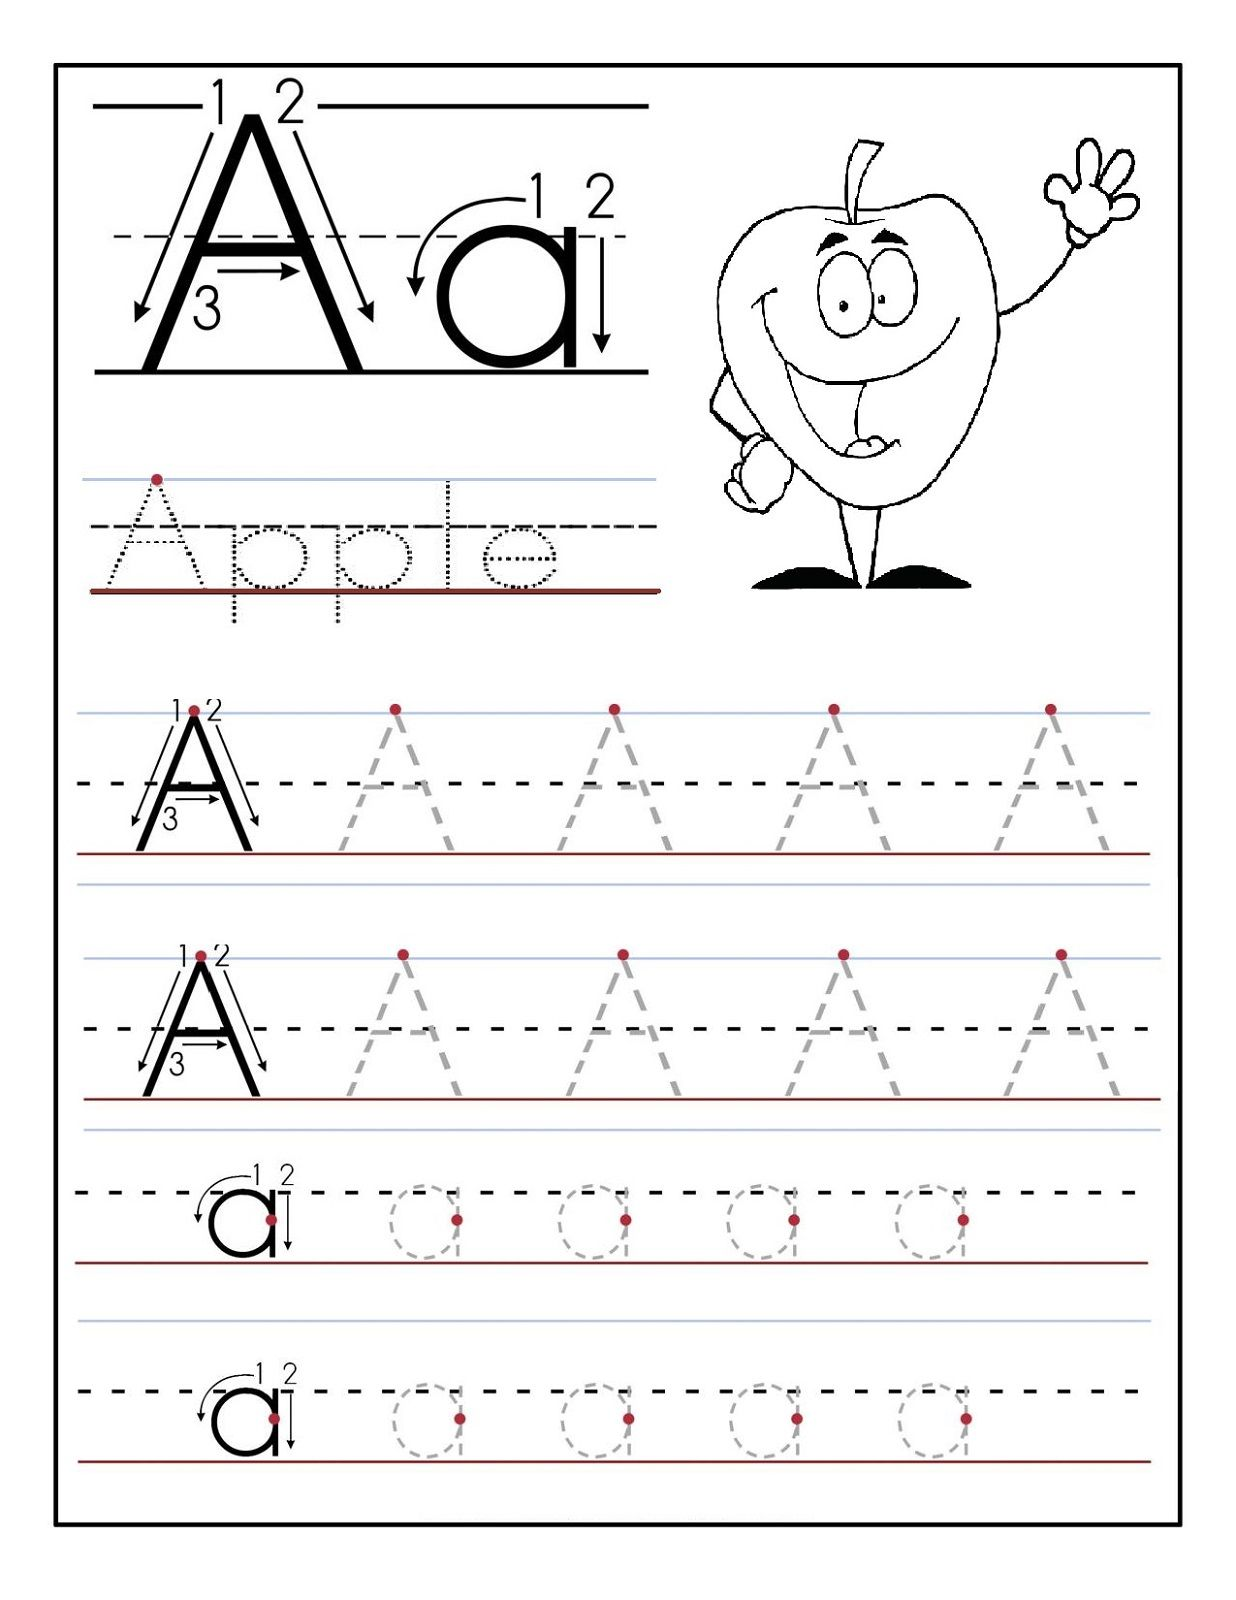 worksheet Letter I Tracing Worksheets Preschool trace the letter a apple artie pinterest worksheets and printable preschool worksheetsalphabet